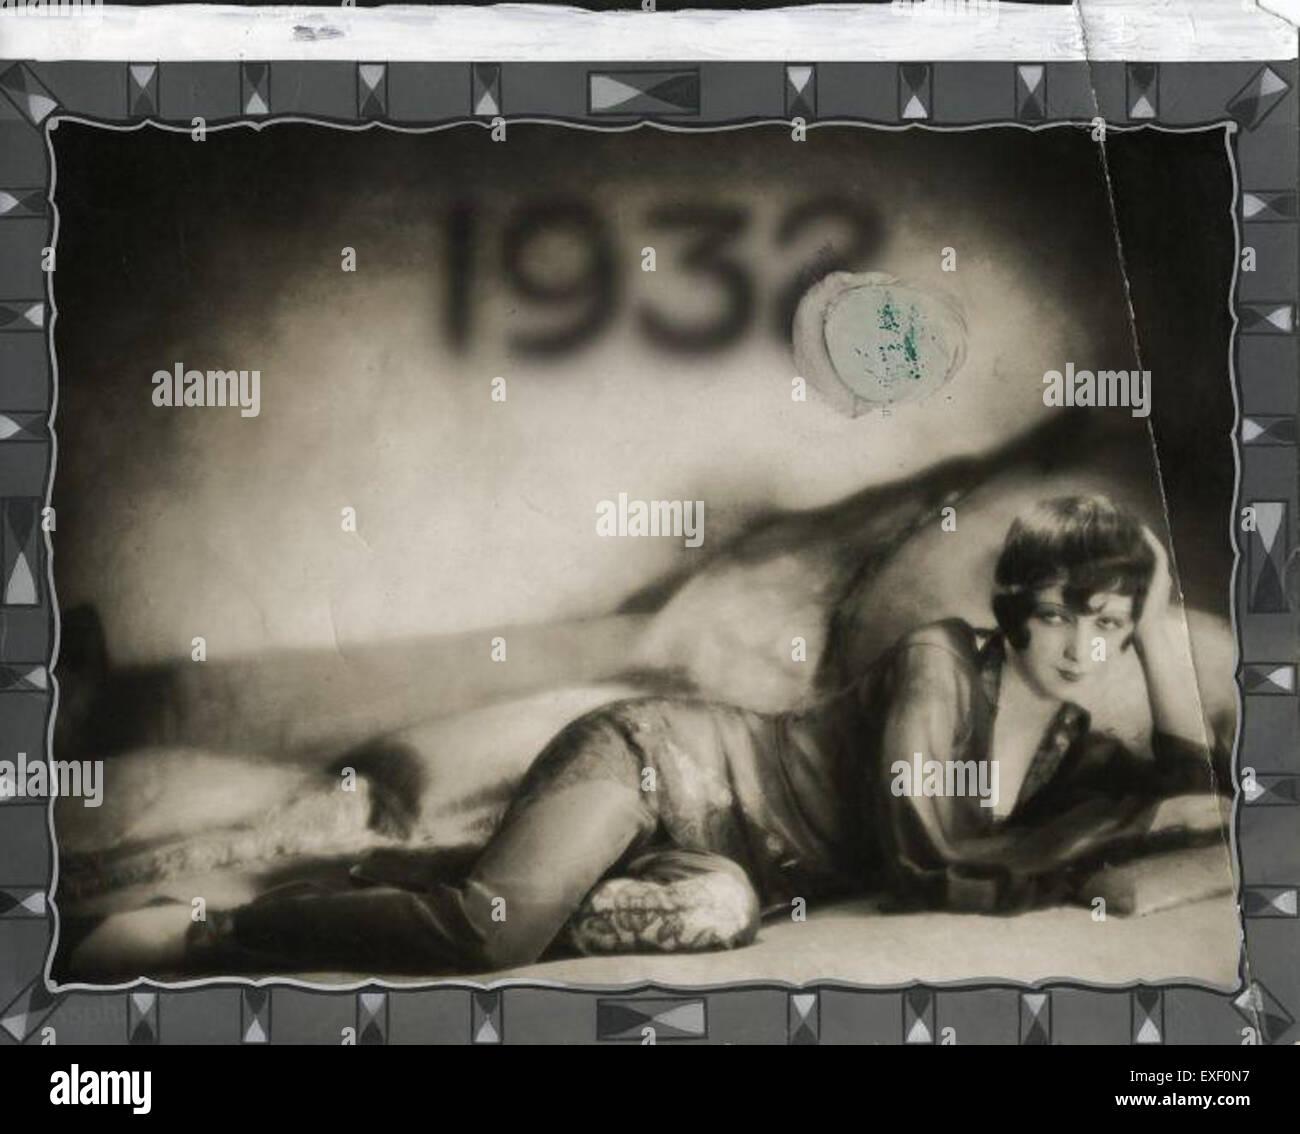 Stacey Nelkin,Sigrid Valdis Porno video Stephen Mangan (born 1968),Sari Lennick